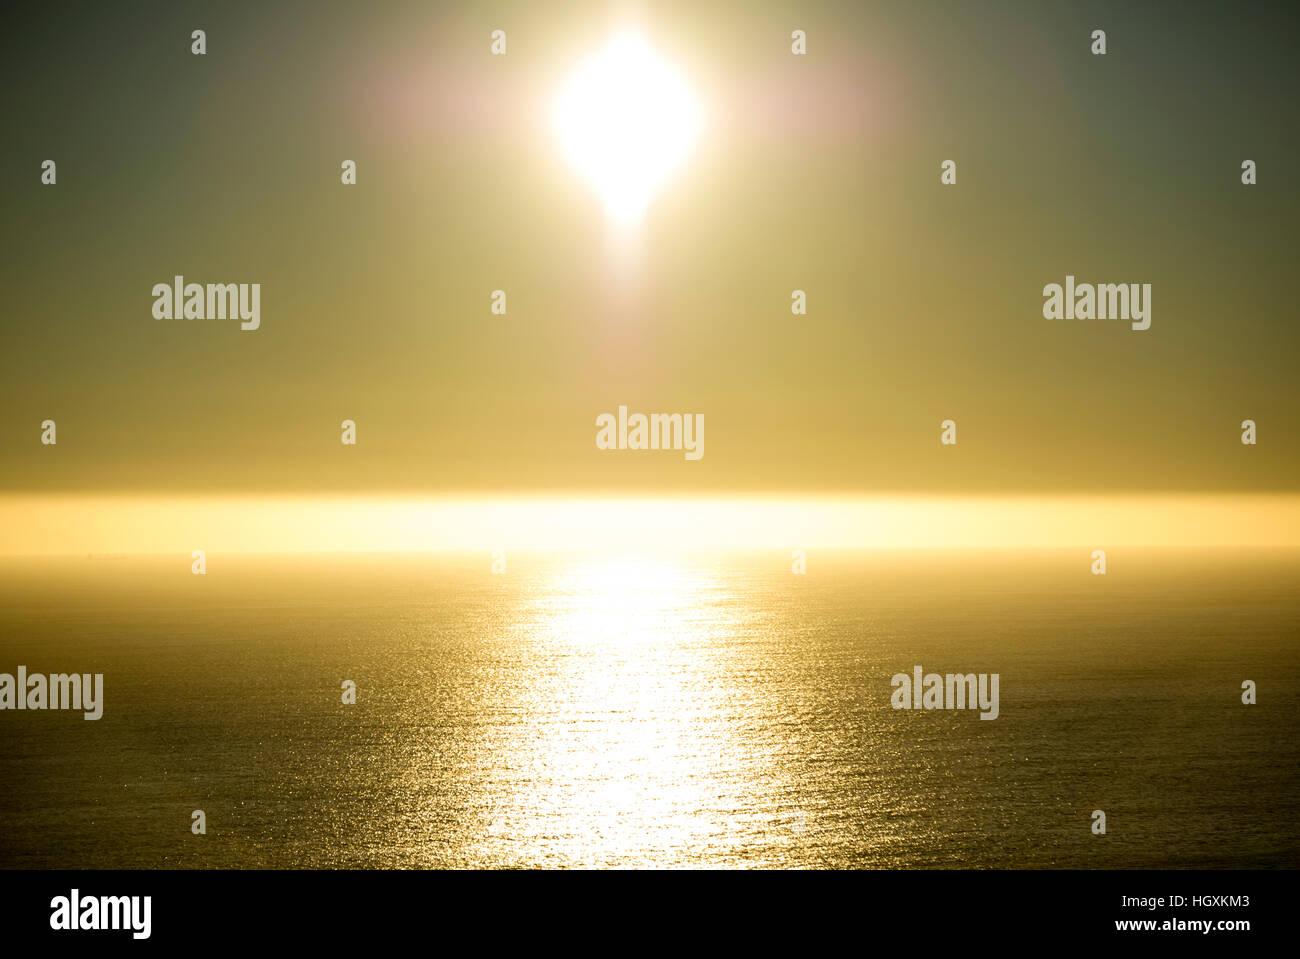 The sun casts a golden pillar on the ocean as it dips toward sunset. - Stock Image